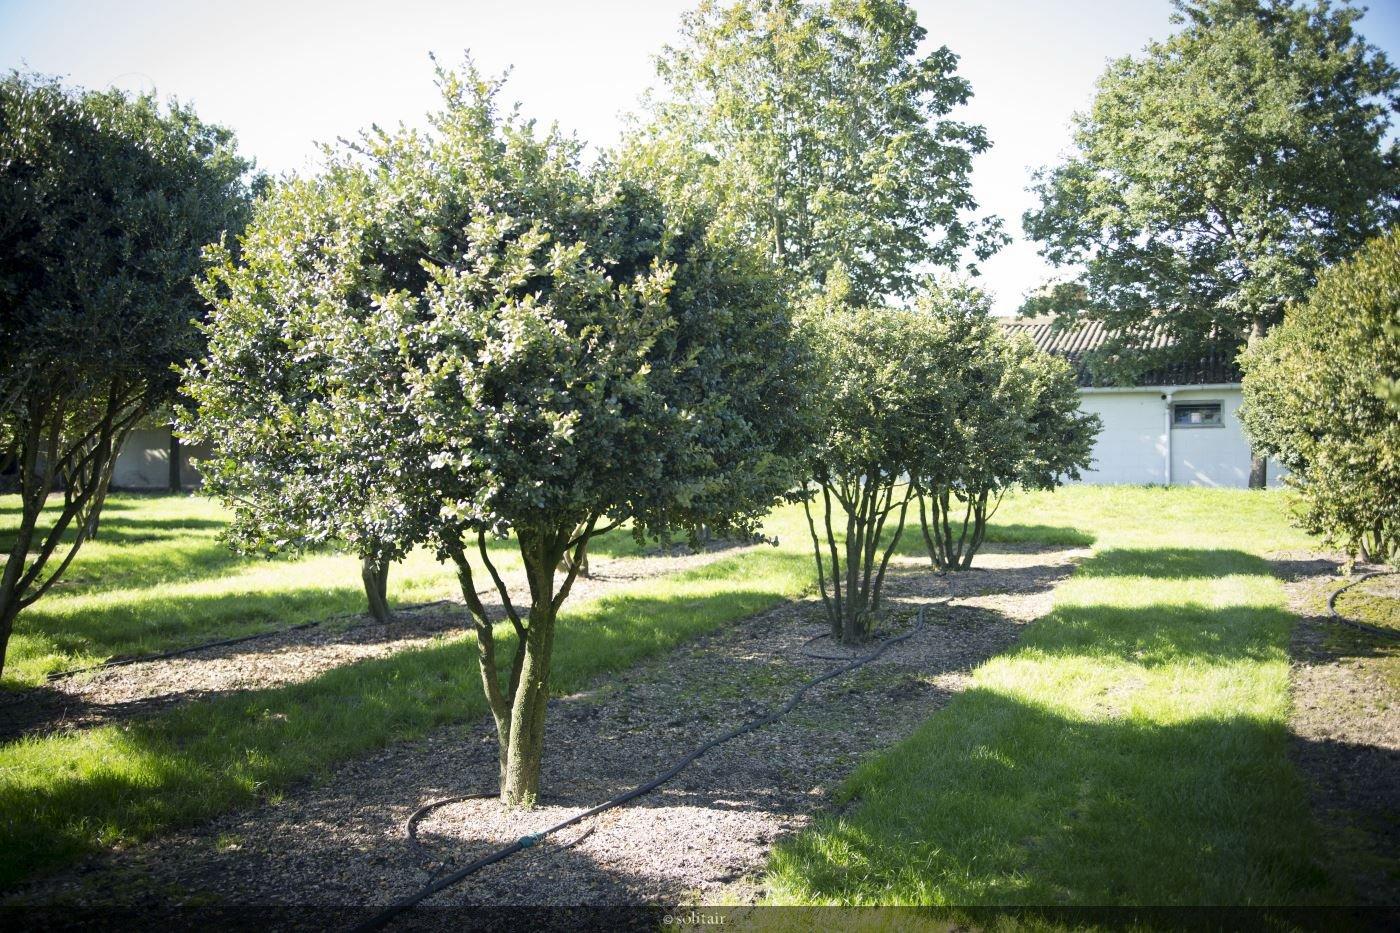 Buxus sempervirens 'Rotundifolia' meerstam